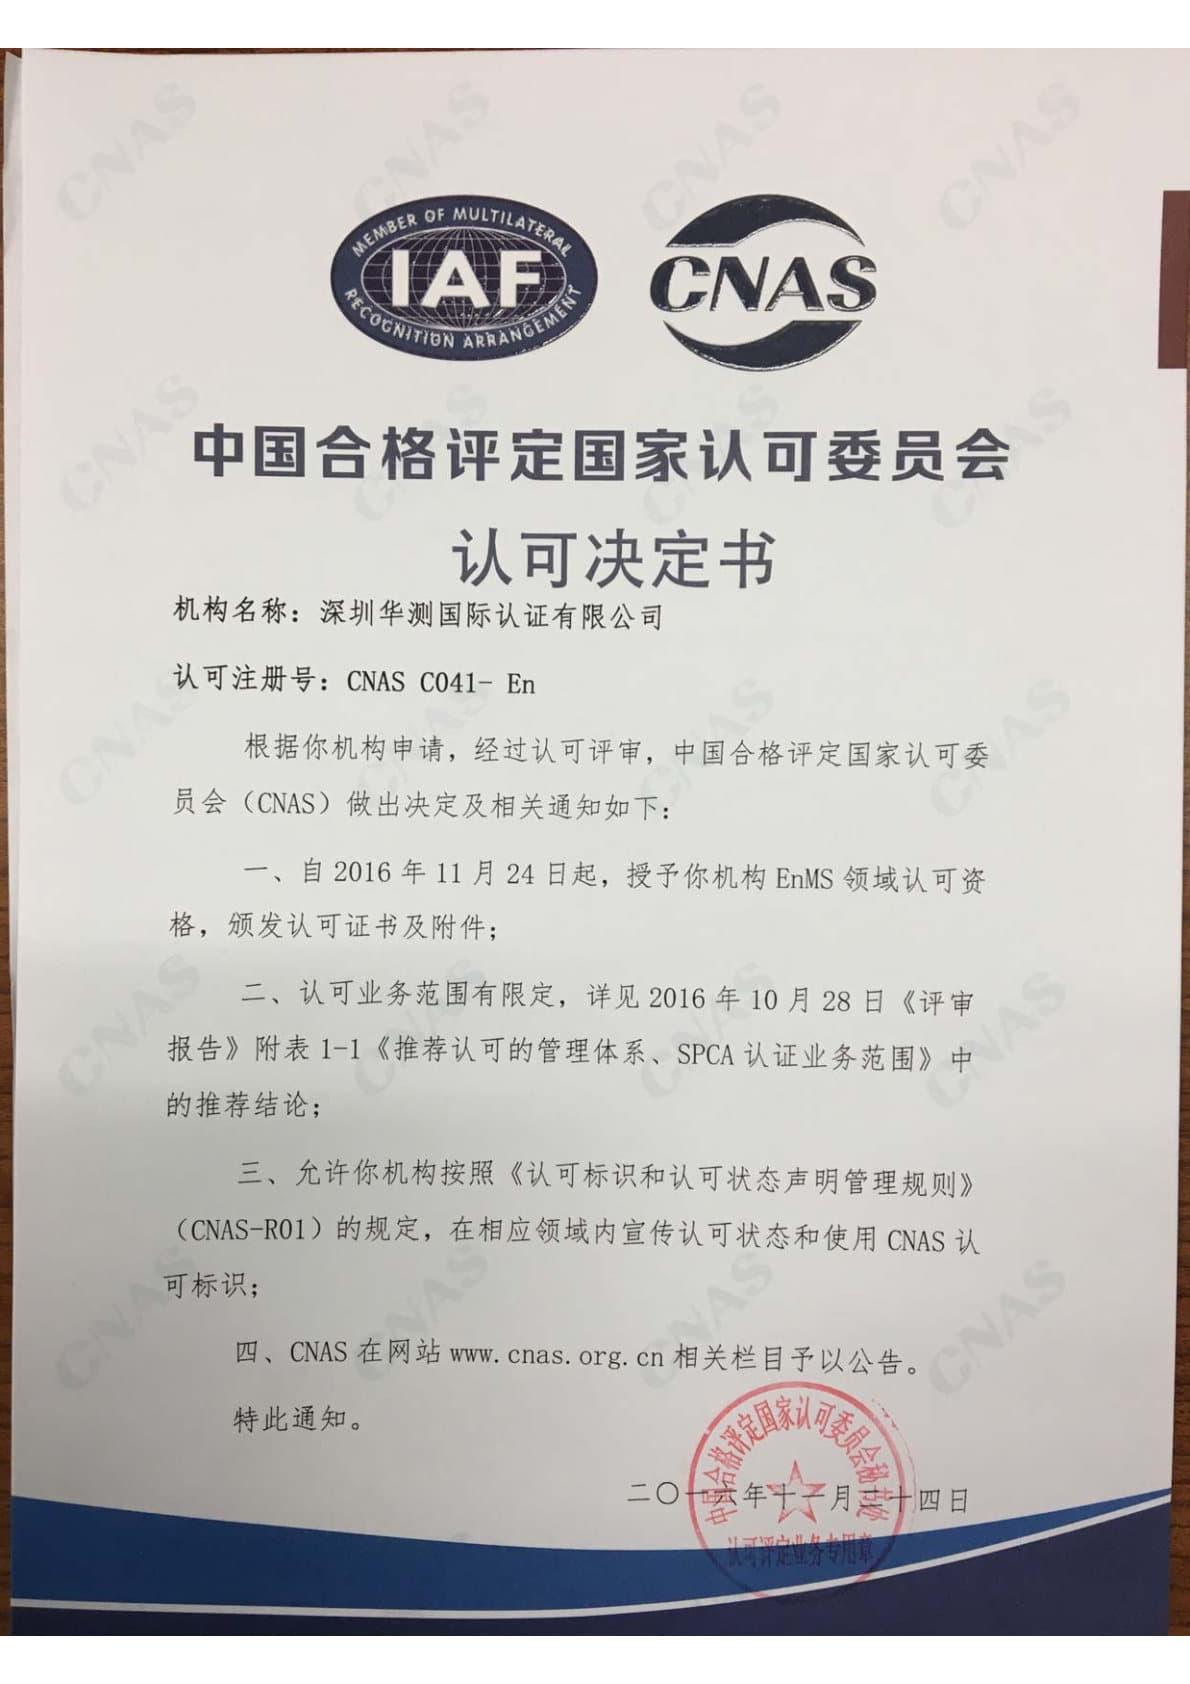 EnMS能源管理体系认证机构认可证书(CNAS)